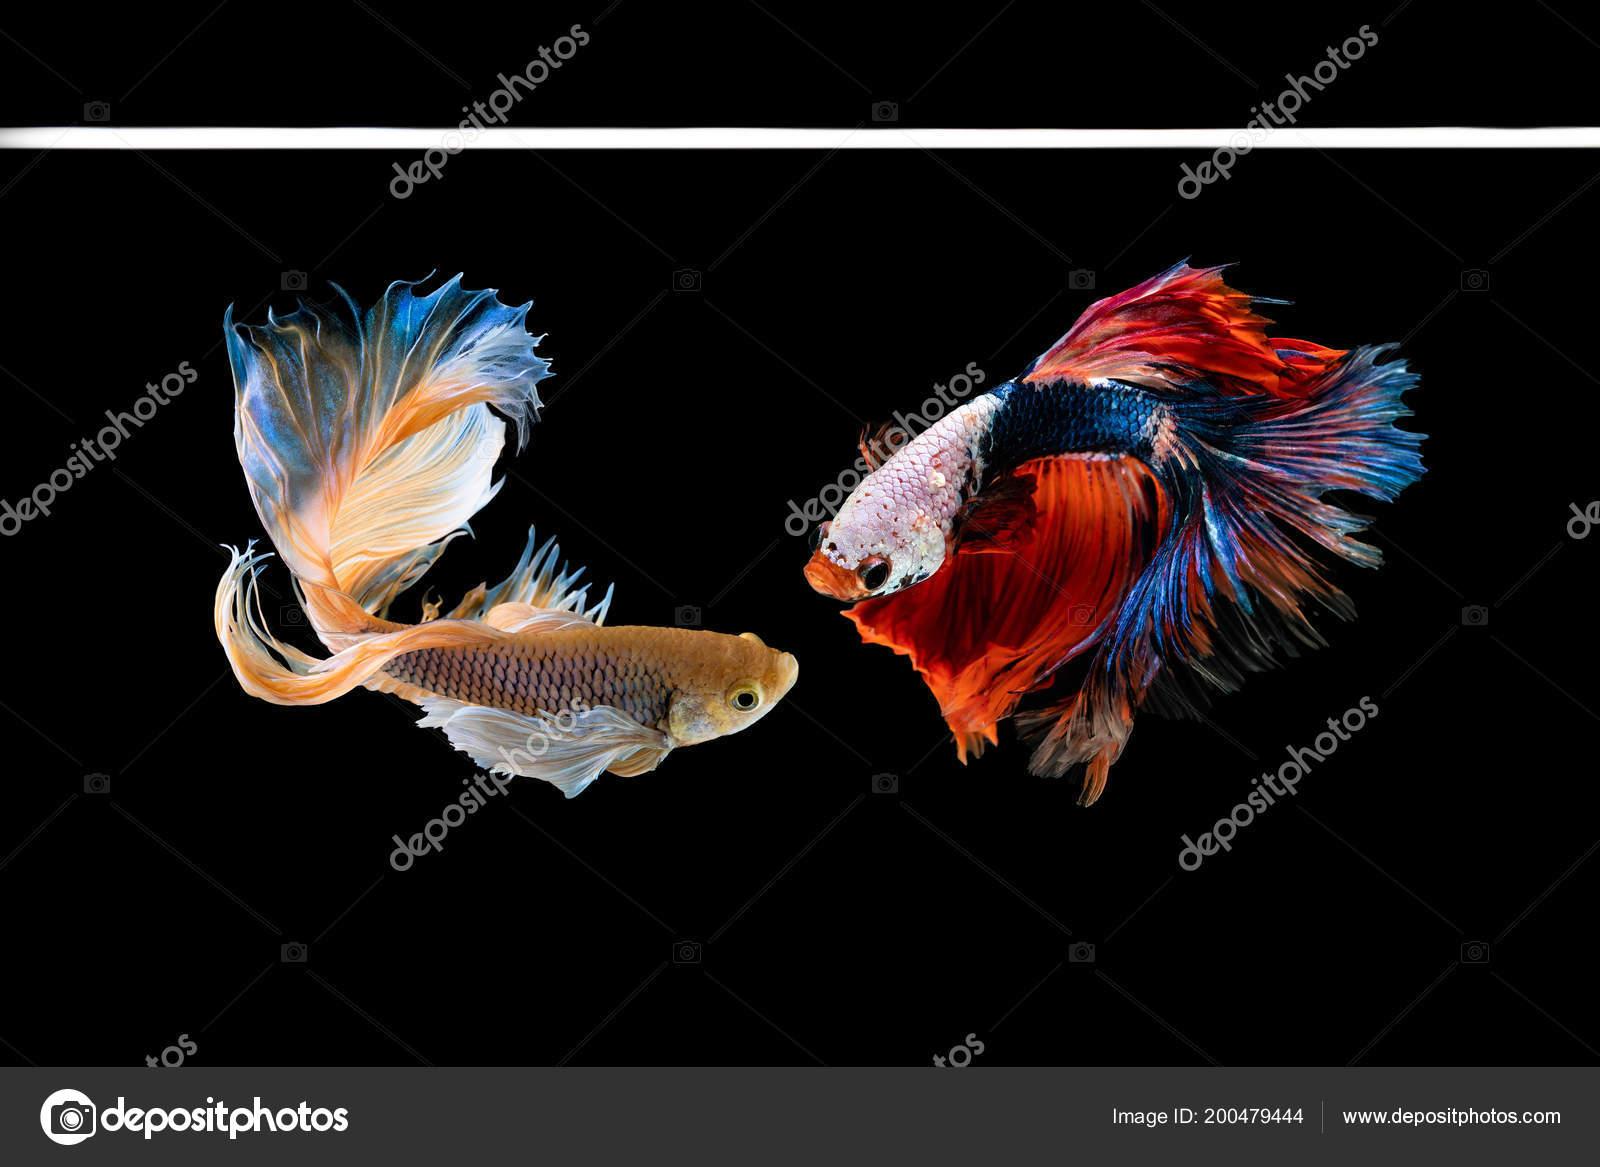 Halfmoon Betta Beautiful Fish Capture Moving Moment Beautiful Siam